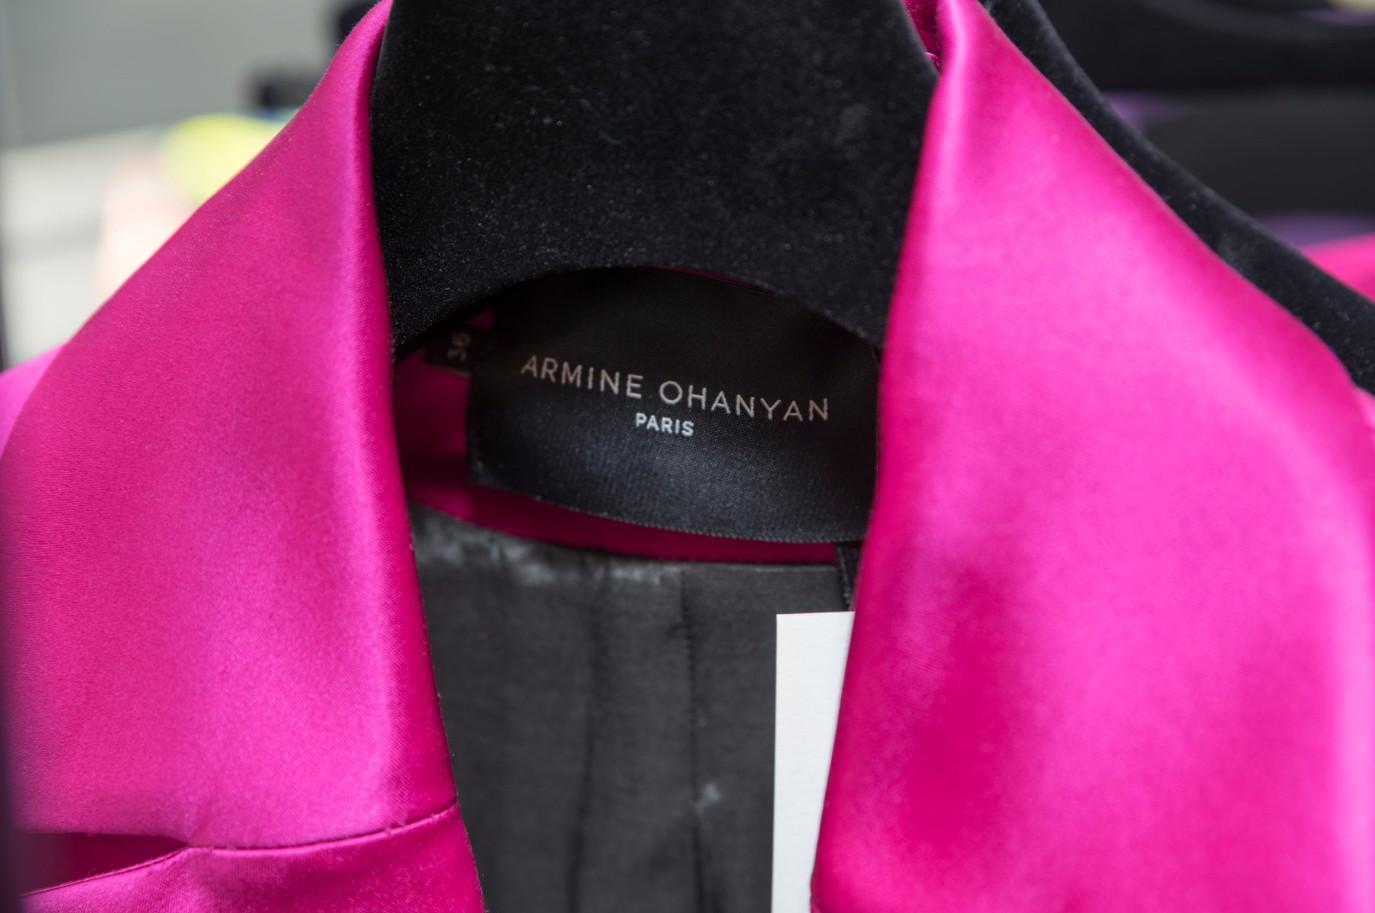 Armine ohanyan aw21 at paris fashion week. (3)